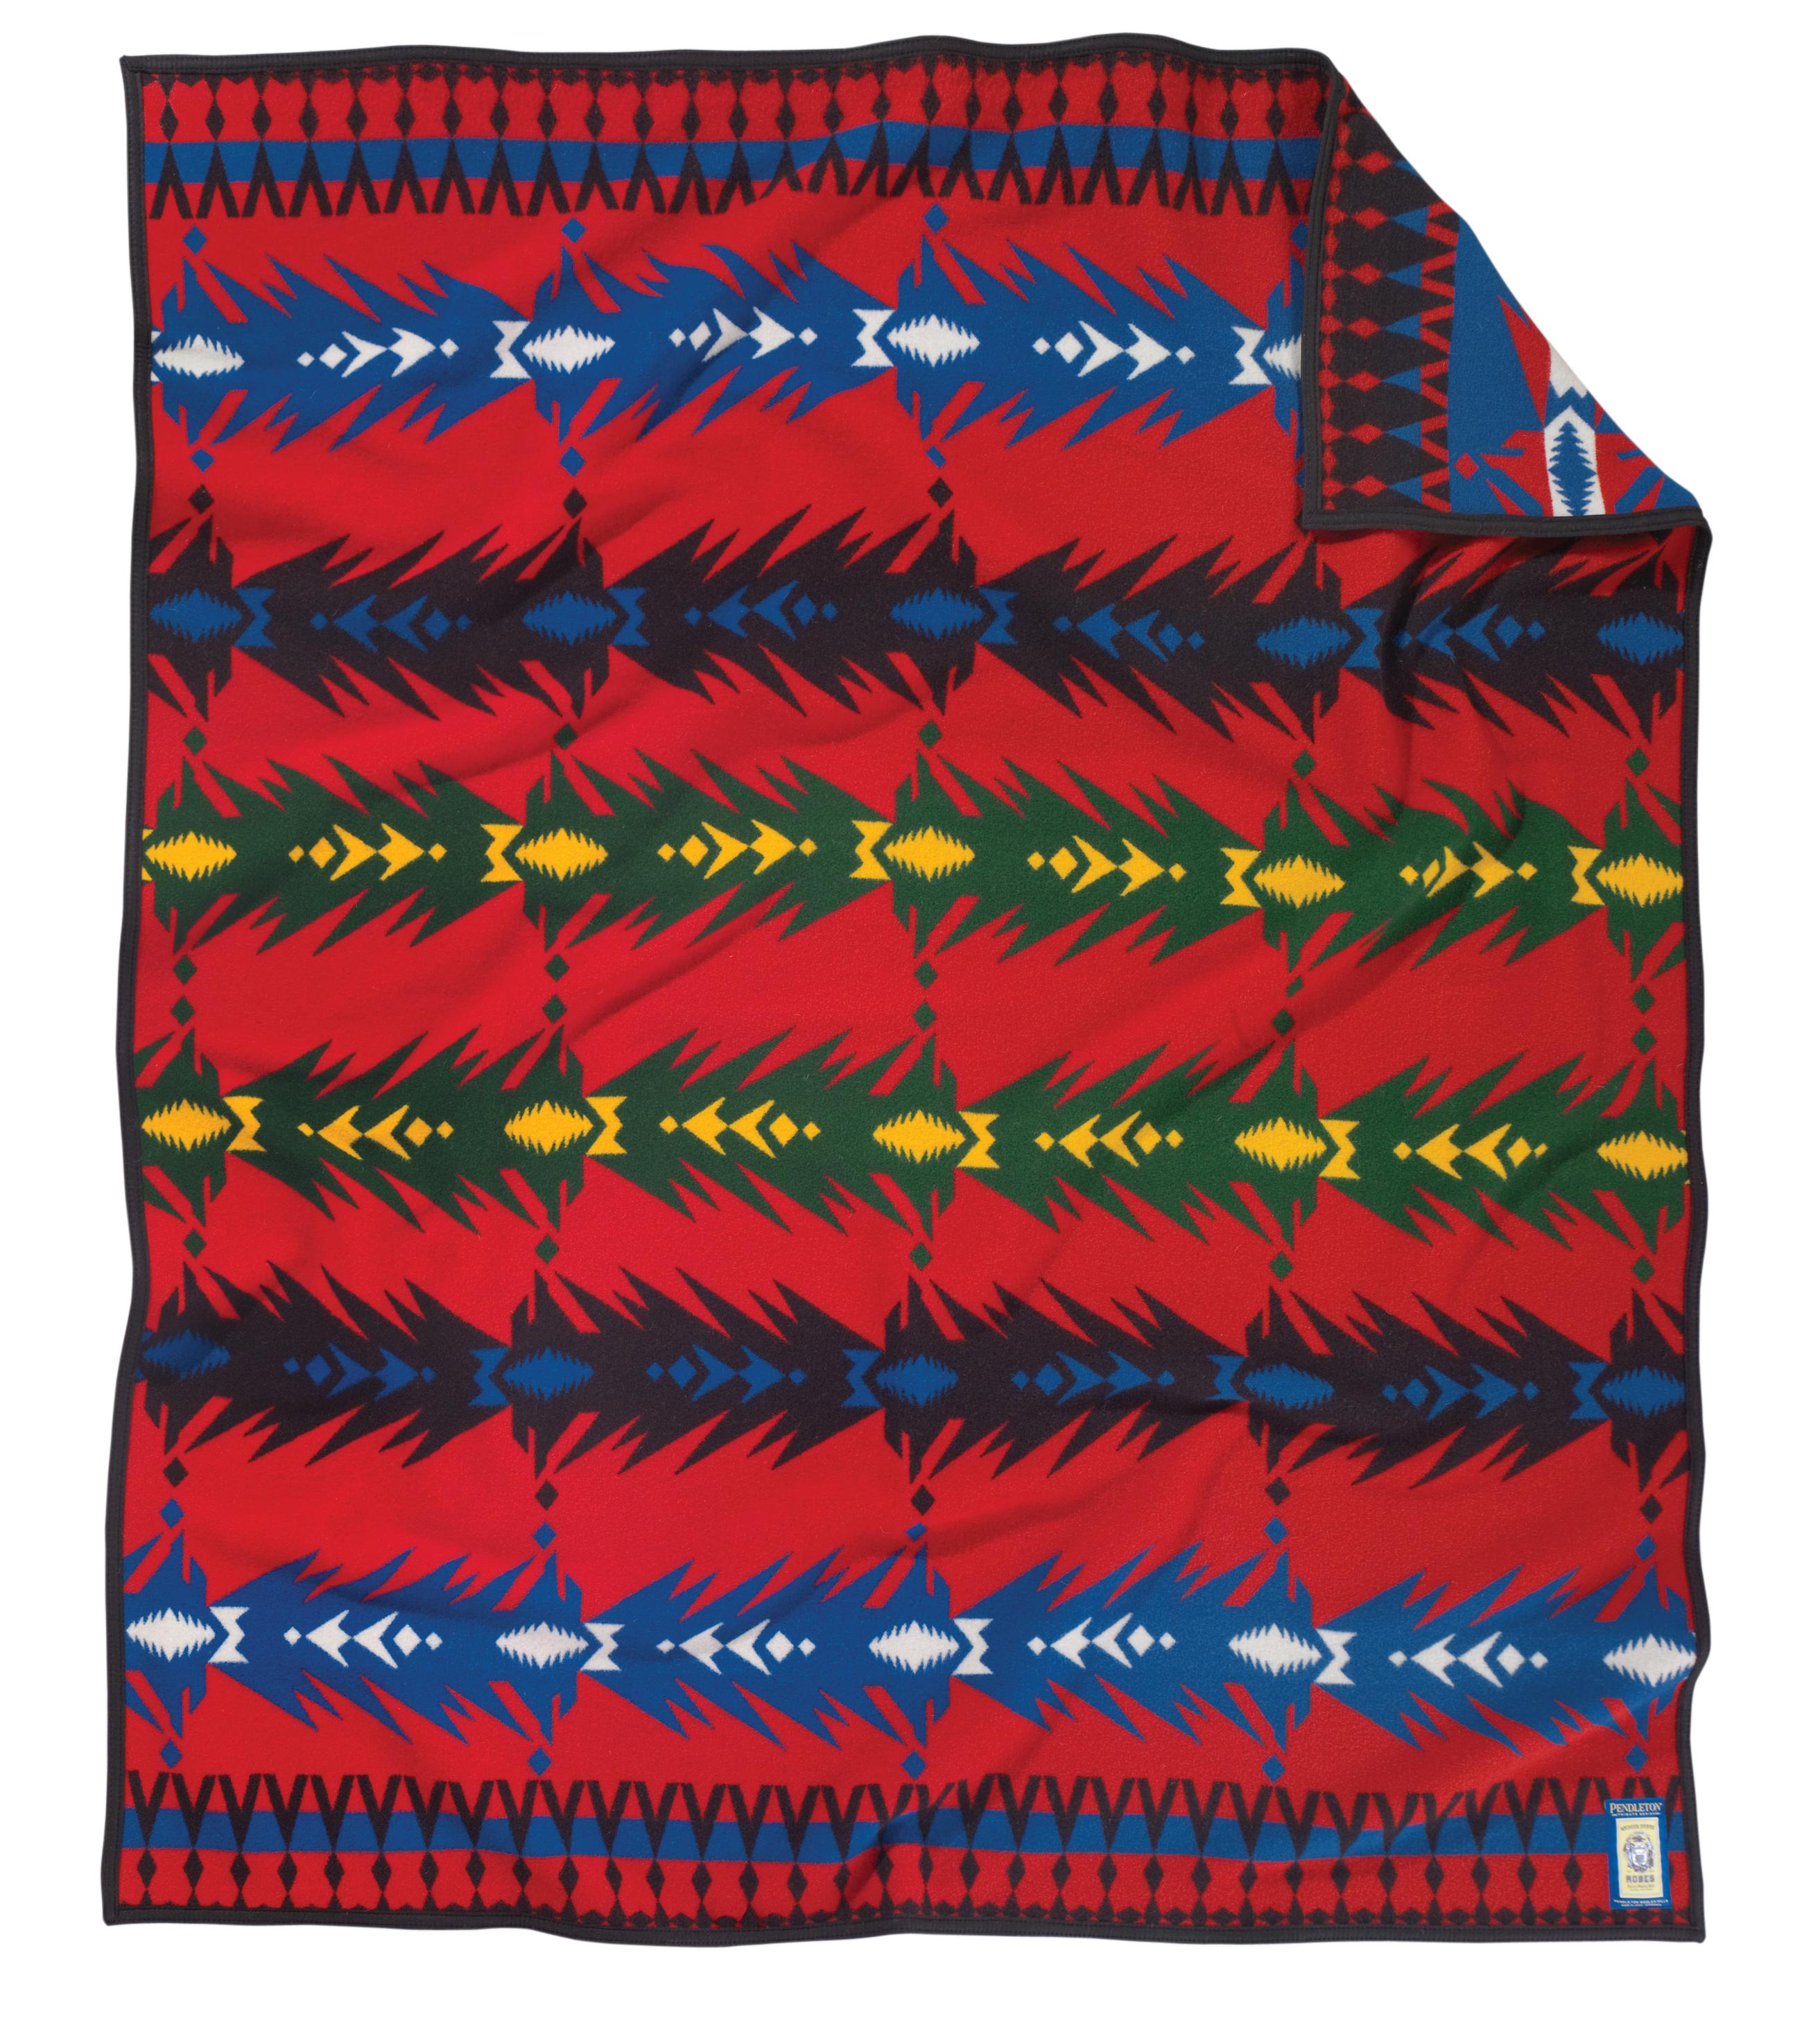 Racine Tribute blanket #1